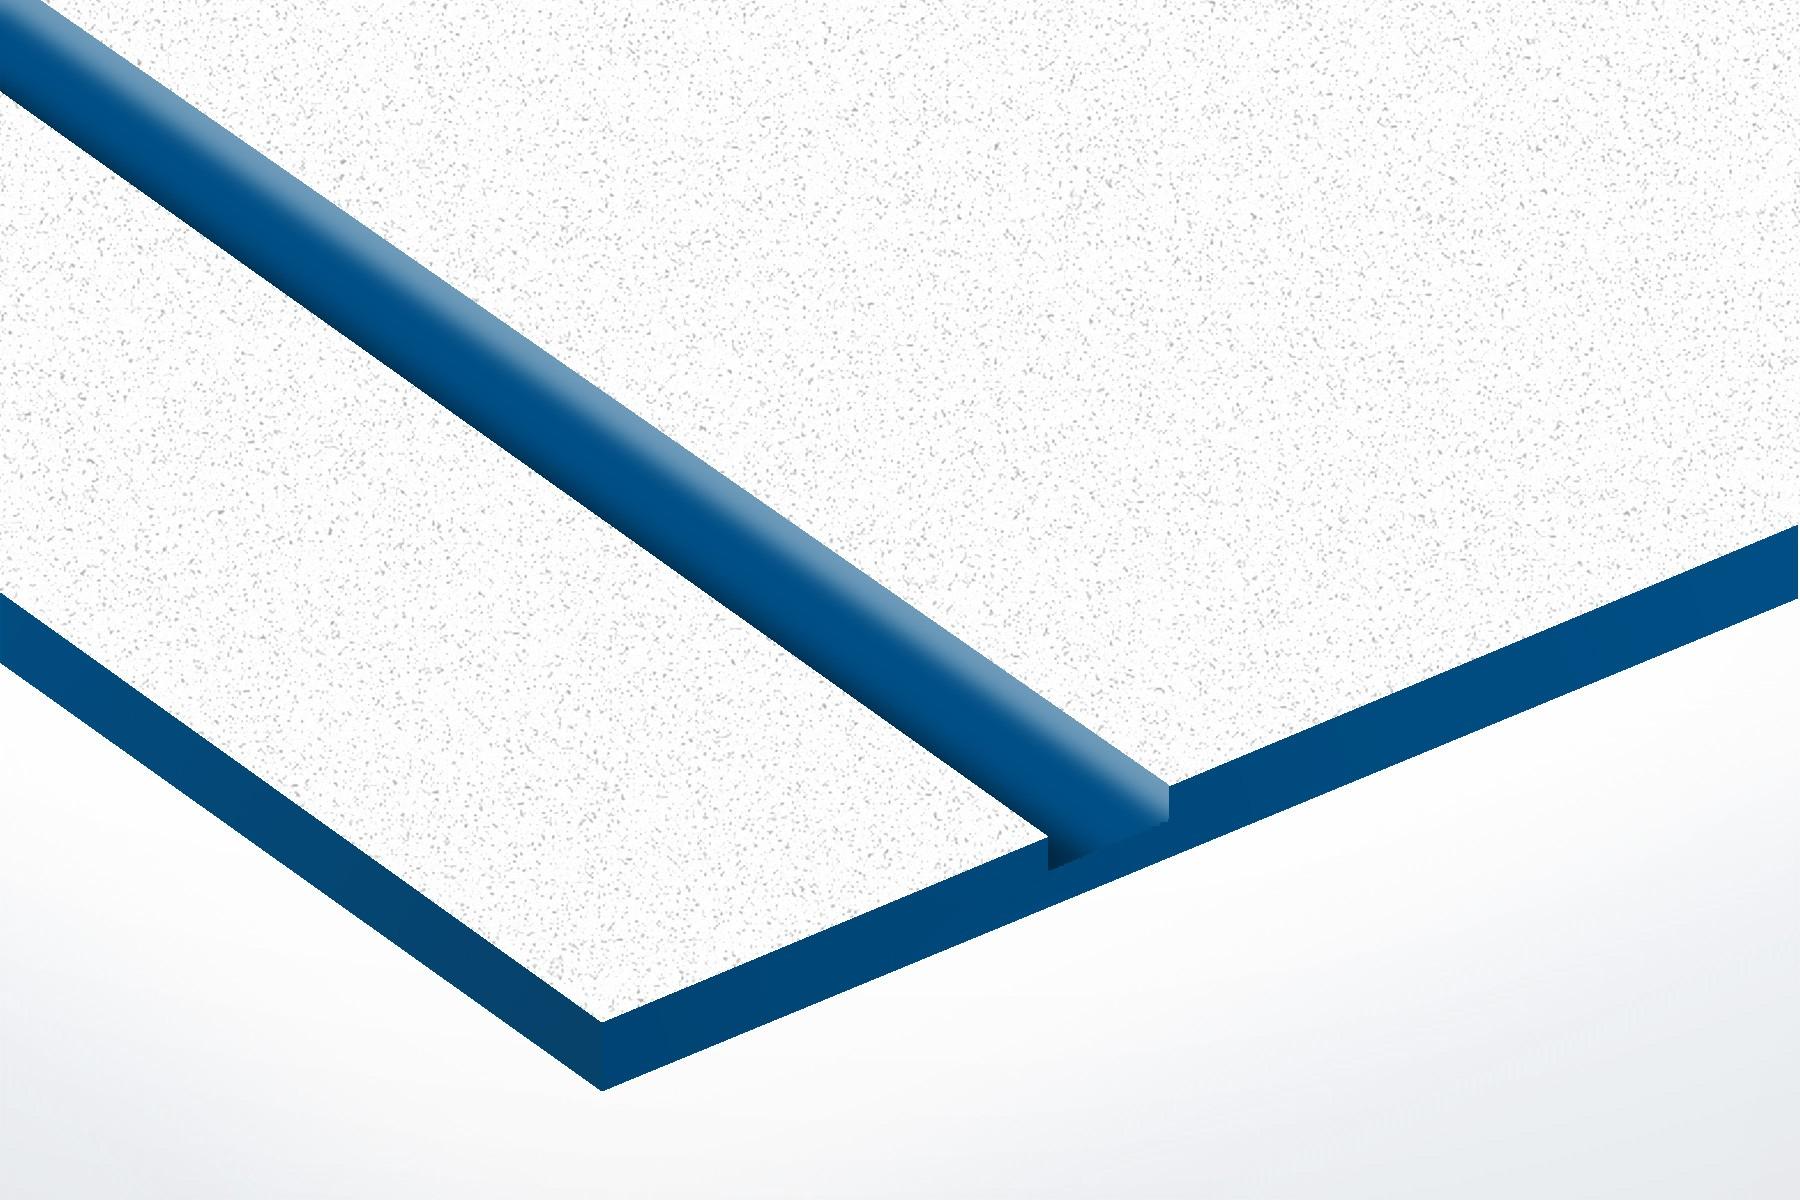 TroLase Textures, White/Blue, 2ply, 1.6 mm